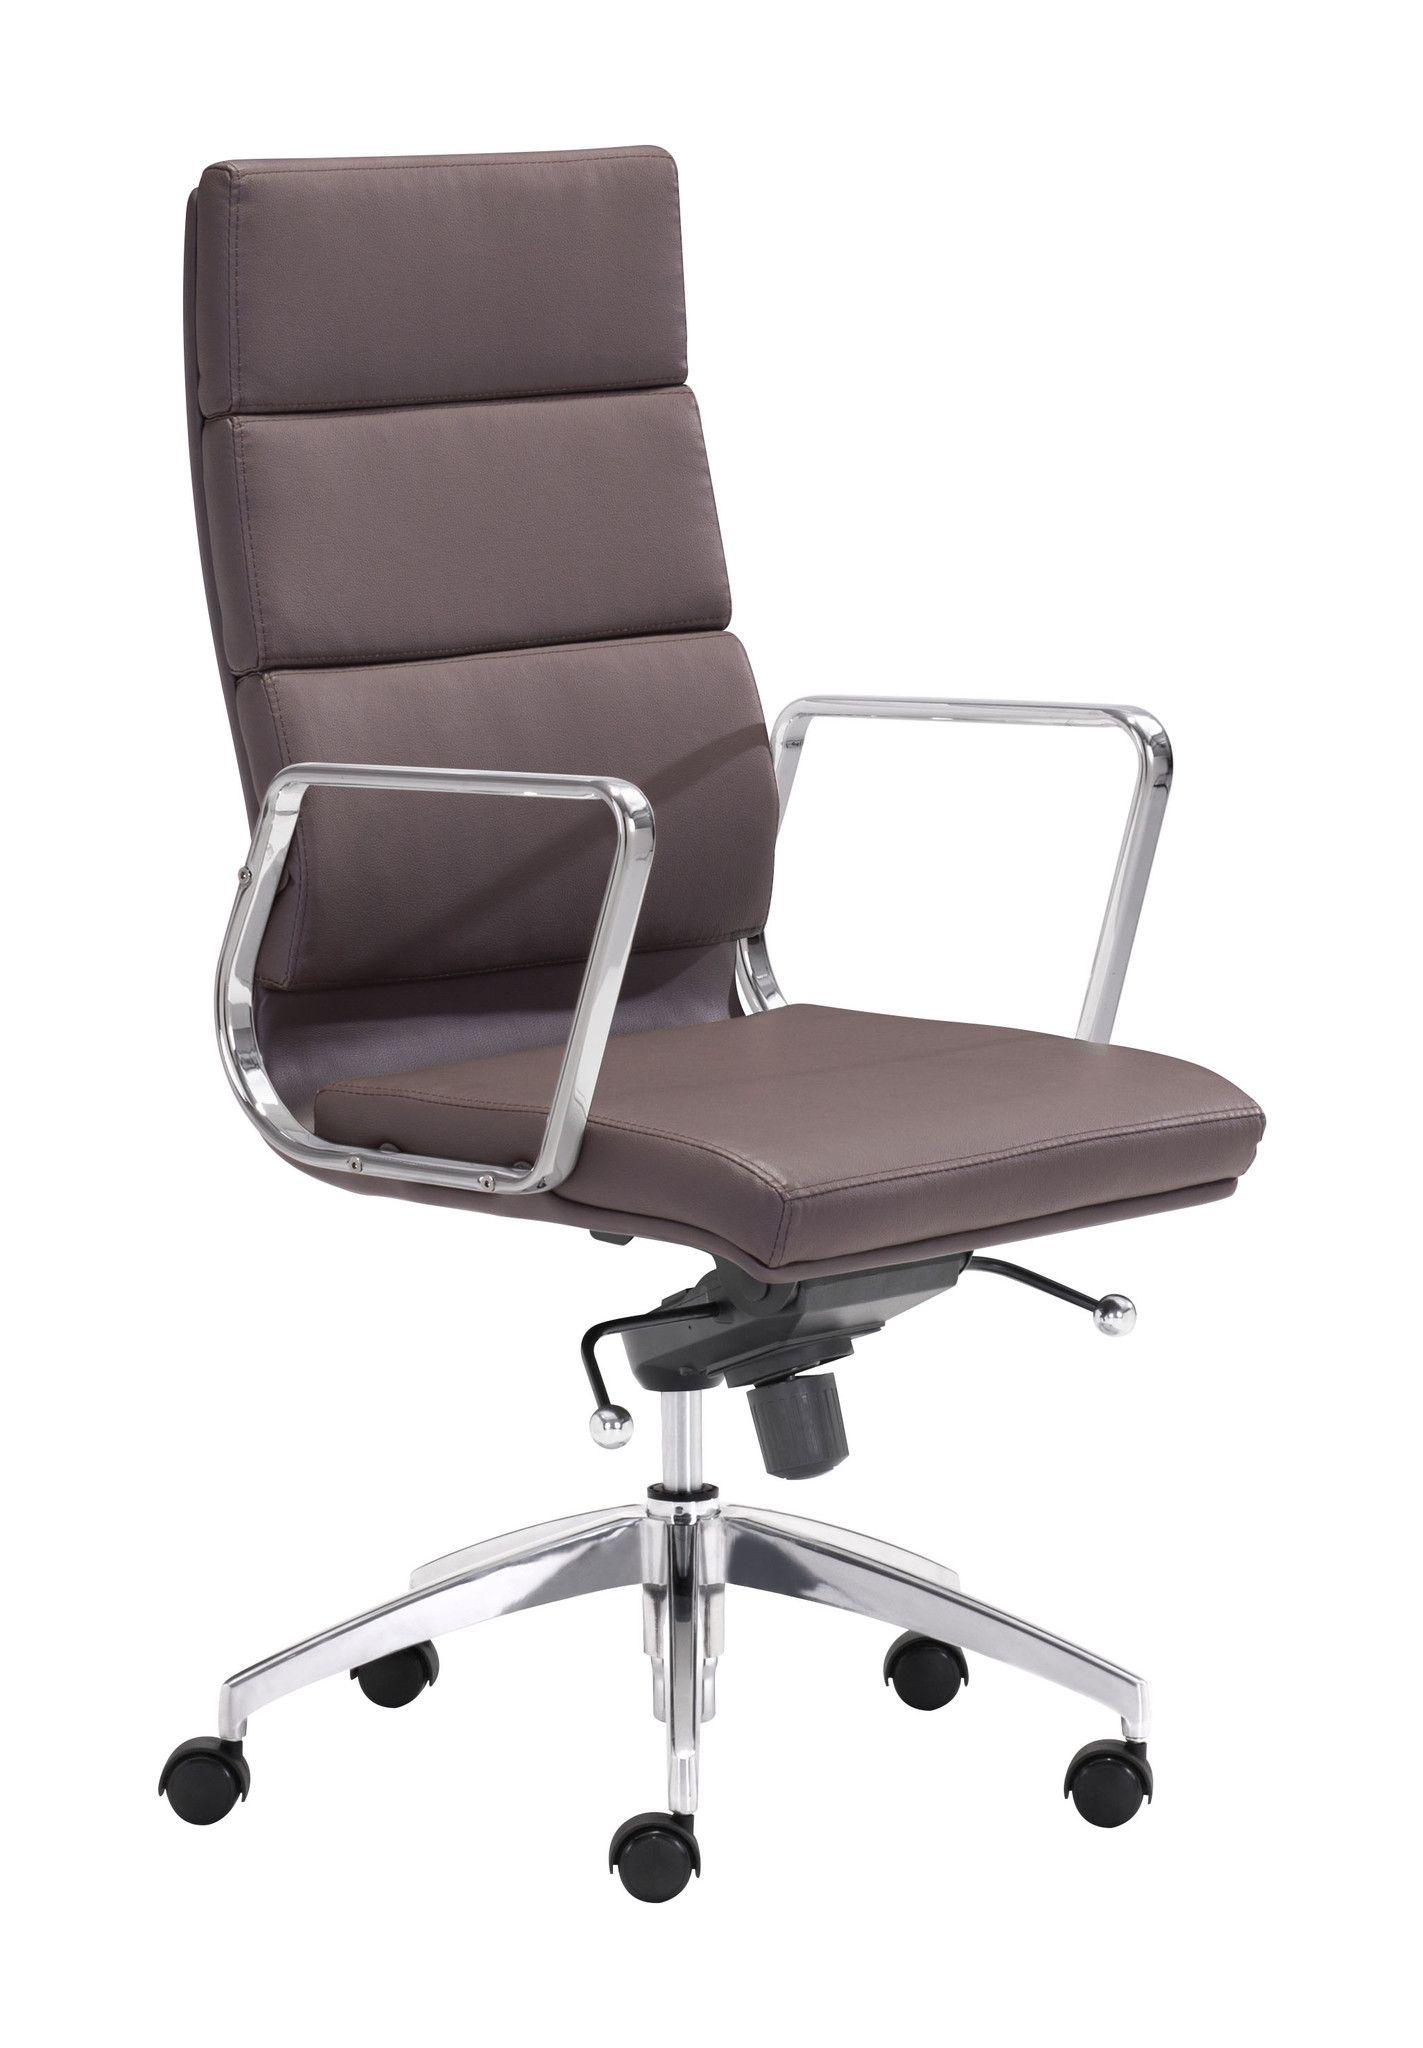 Architect Highback Office Chair | Espresso